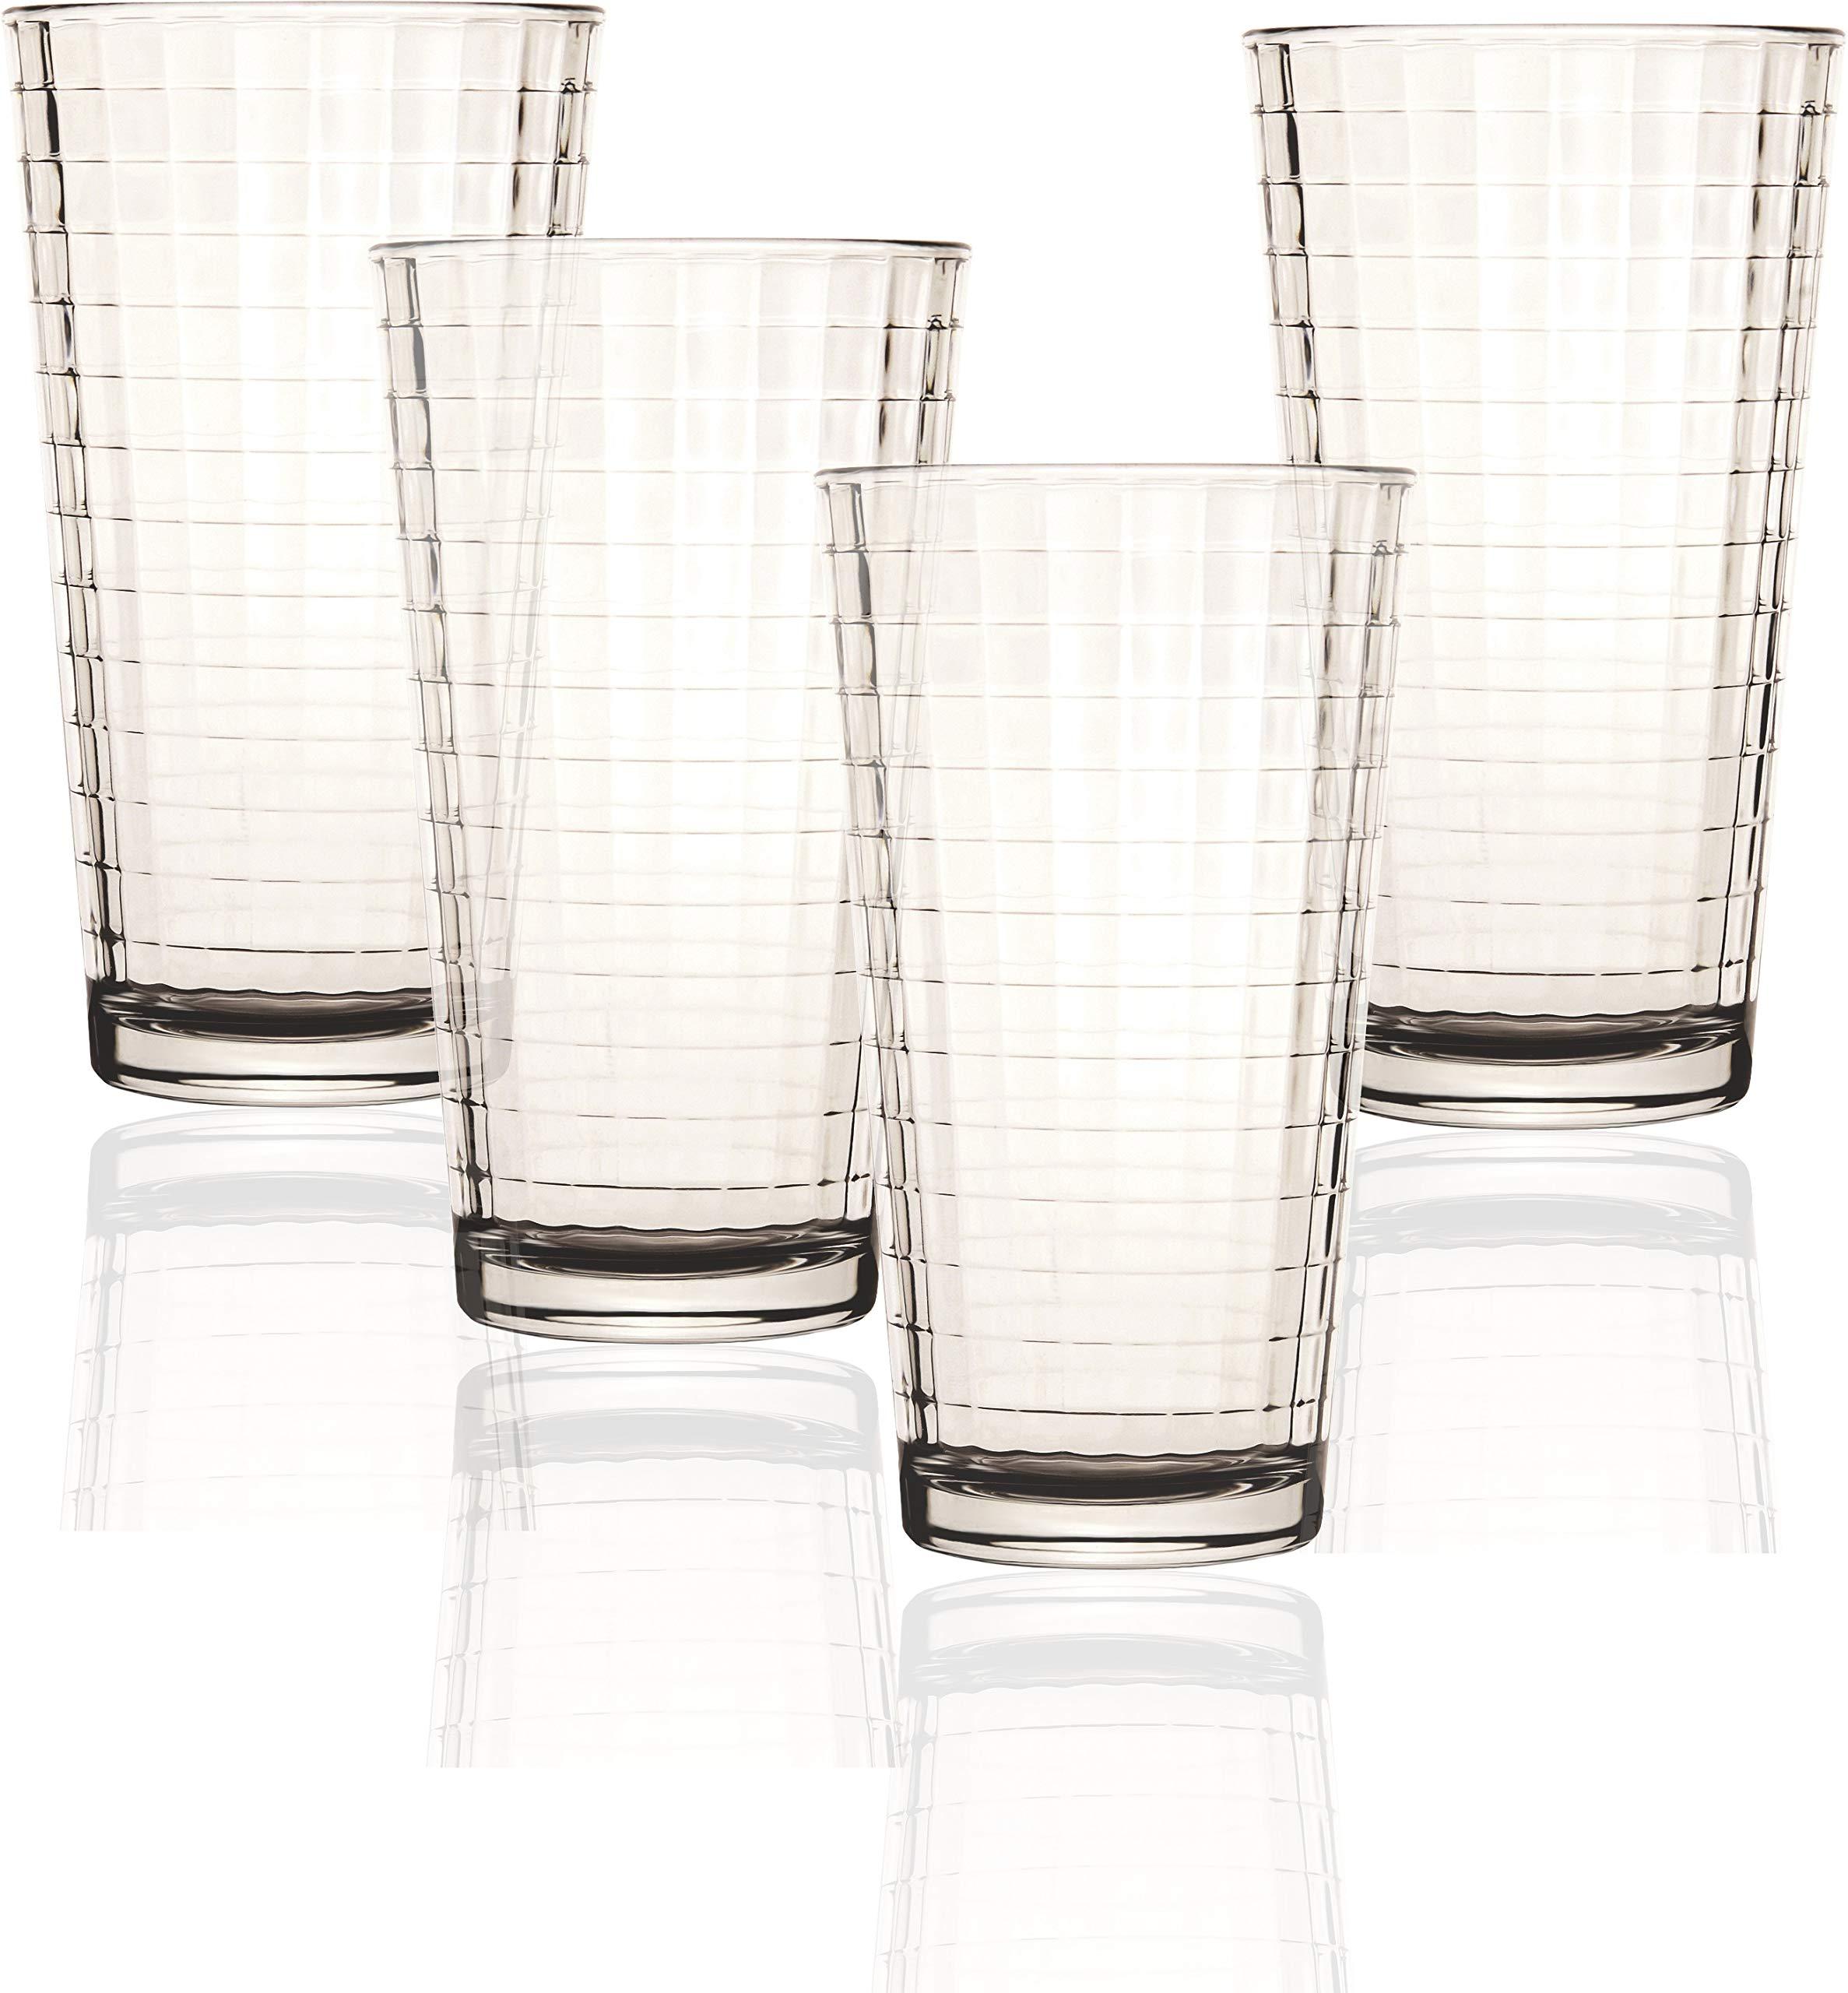 Circleware 40110 Matrix Set of 4-15.7 oz,Heavy Base Highball Tumbler Drinking Glasses, Entertainment Beverage Glassware Ice Tea Cups for Water, Juice, Milk, Beer, Farmhouse Decor, 4pc, Windowpane